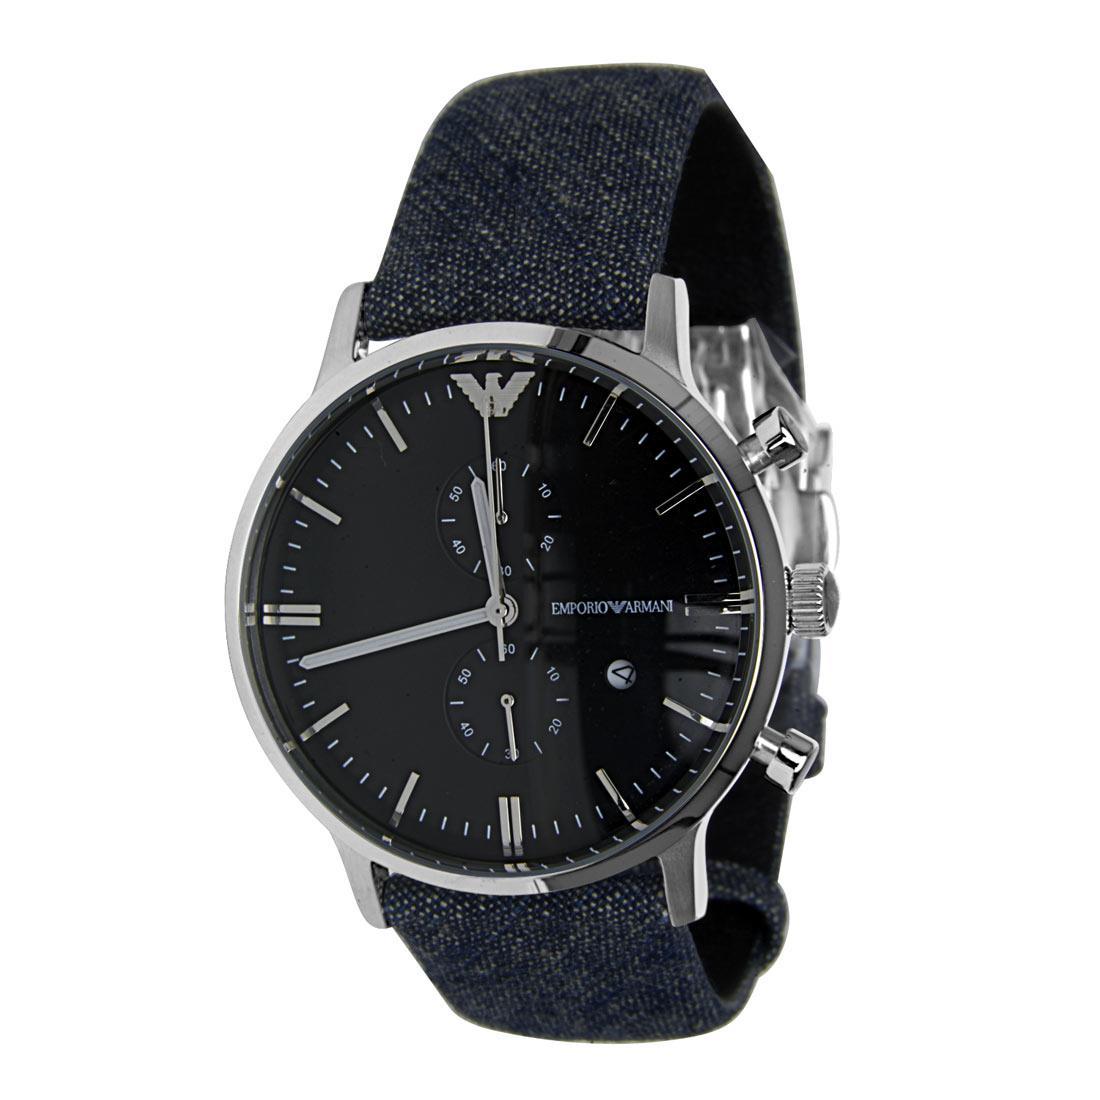 Orologio Armani Watch 40 mm - ARMANI